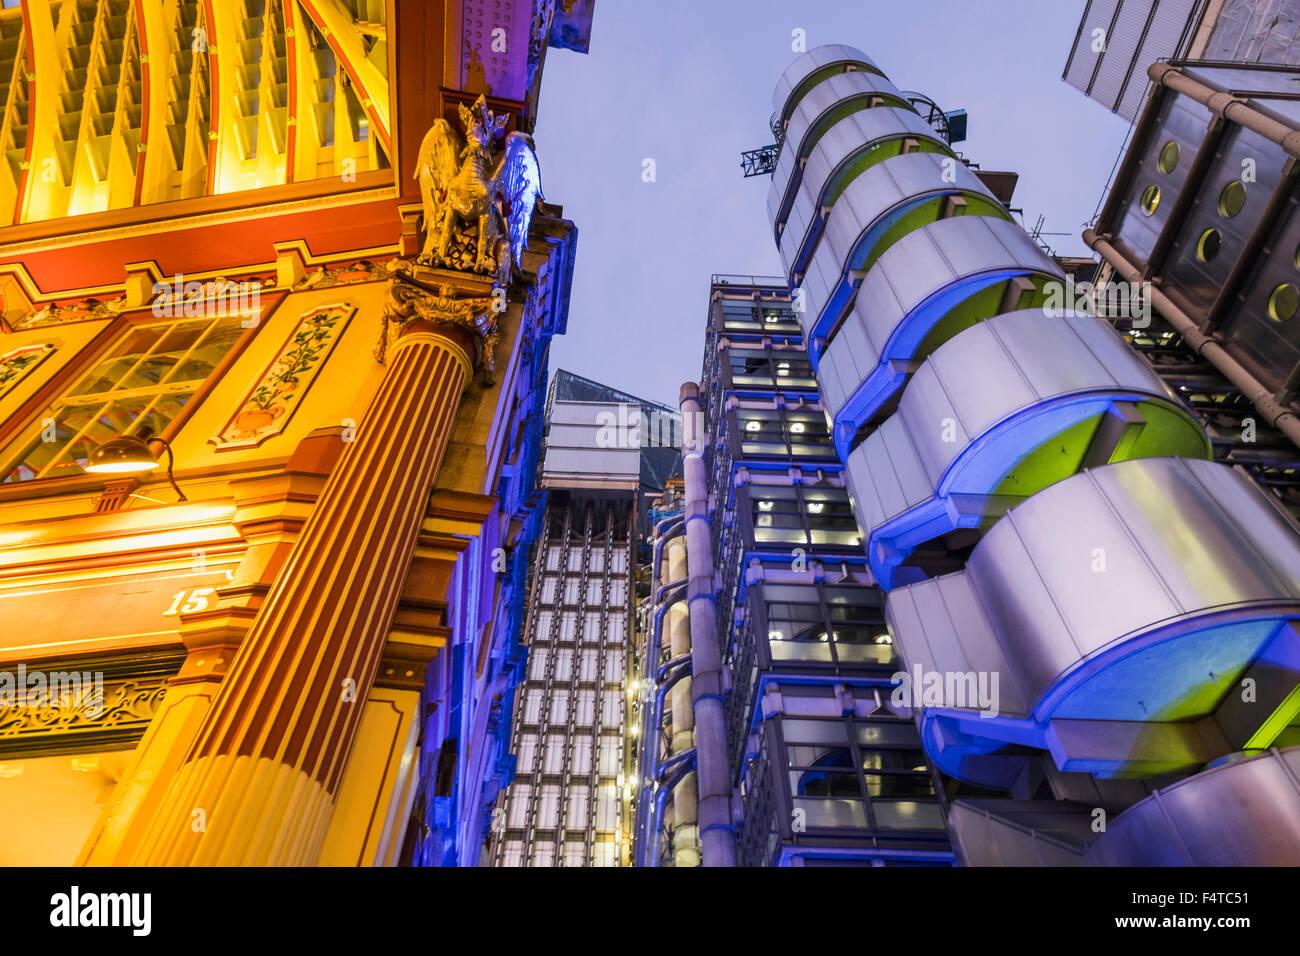 England, London, City, Leadenhall Market und Lloyds Building Stockbild